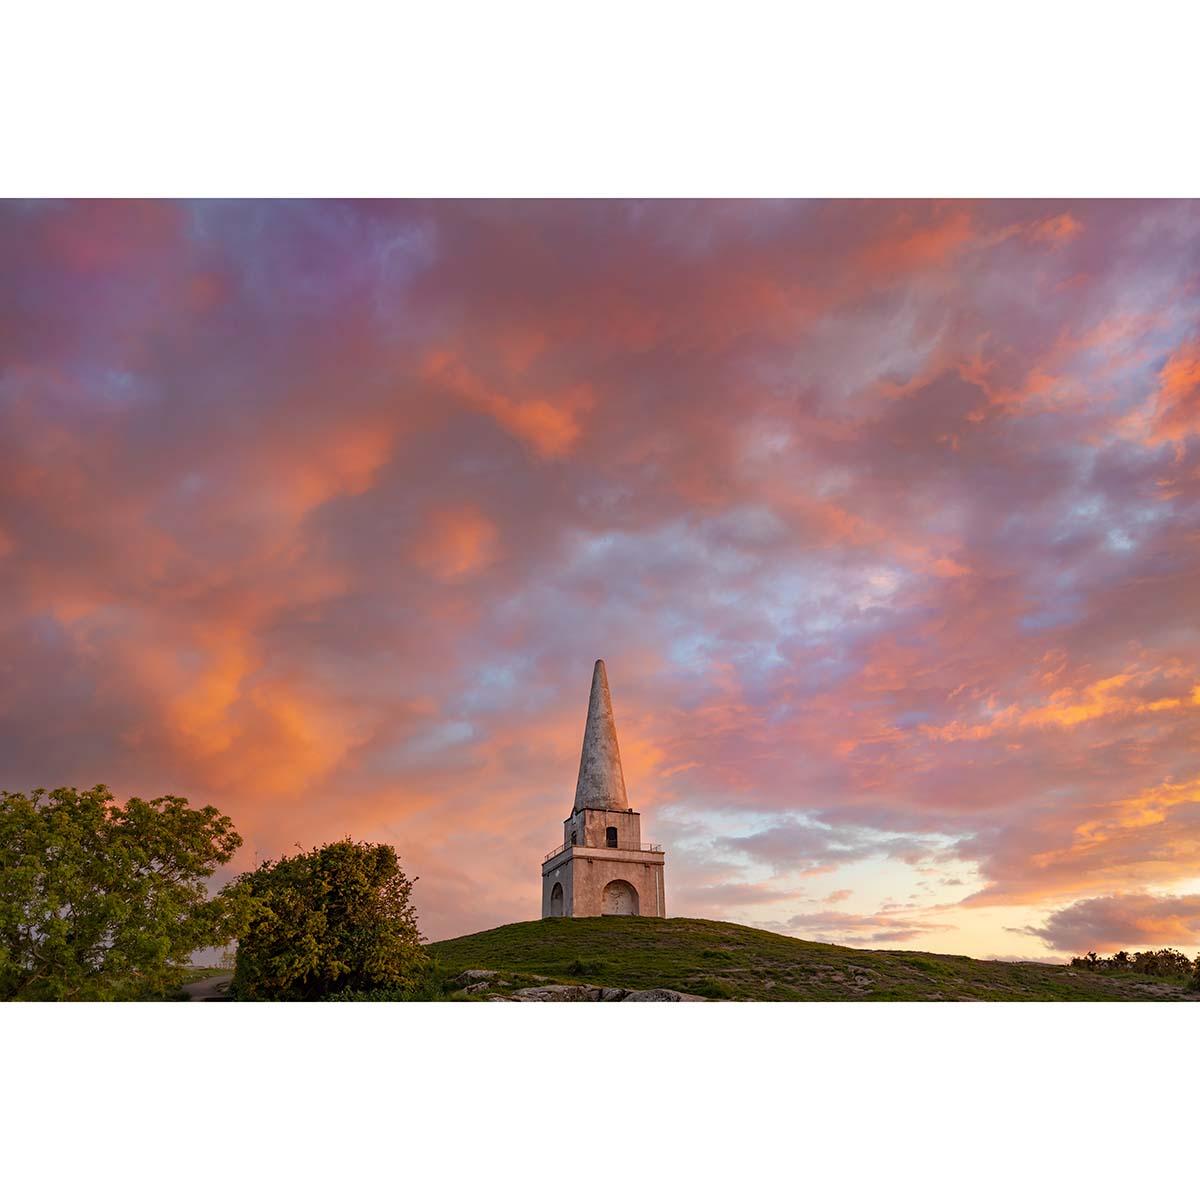 Killiney Obelisk at sunset © Robert Kelly